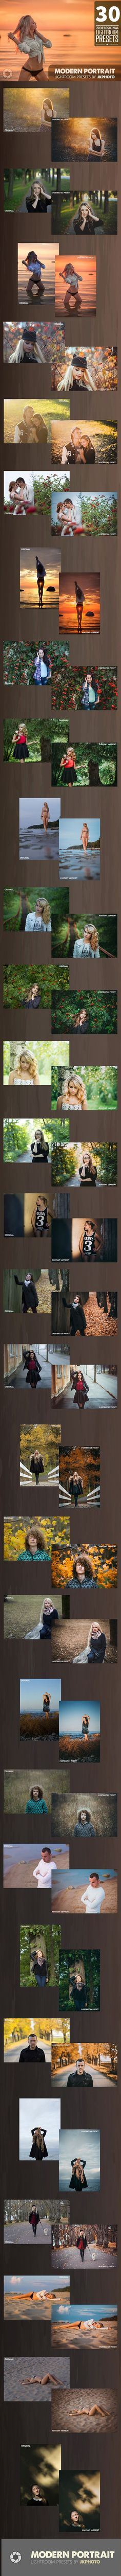 30 Portrait Lightroom Presets #photoeffect Download: http://graphicriver.net/item/30-portrait-lightroom-presets/11213141?ref=ksioks